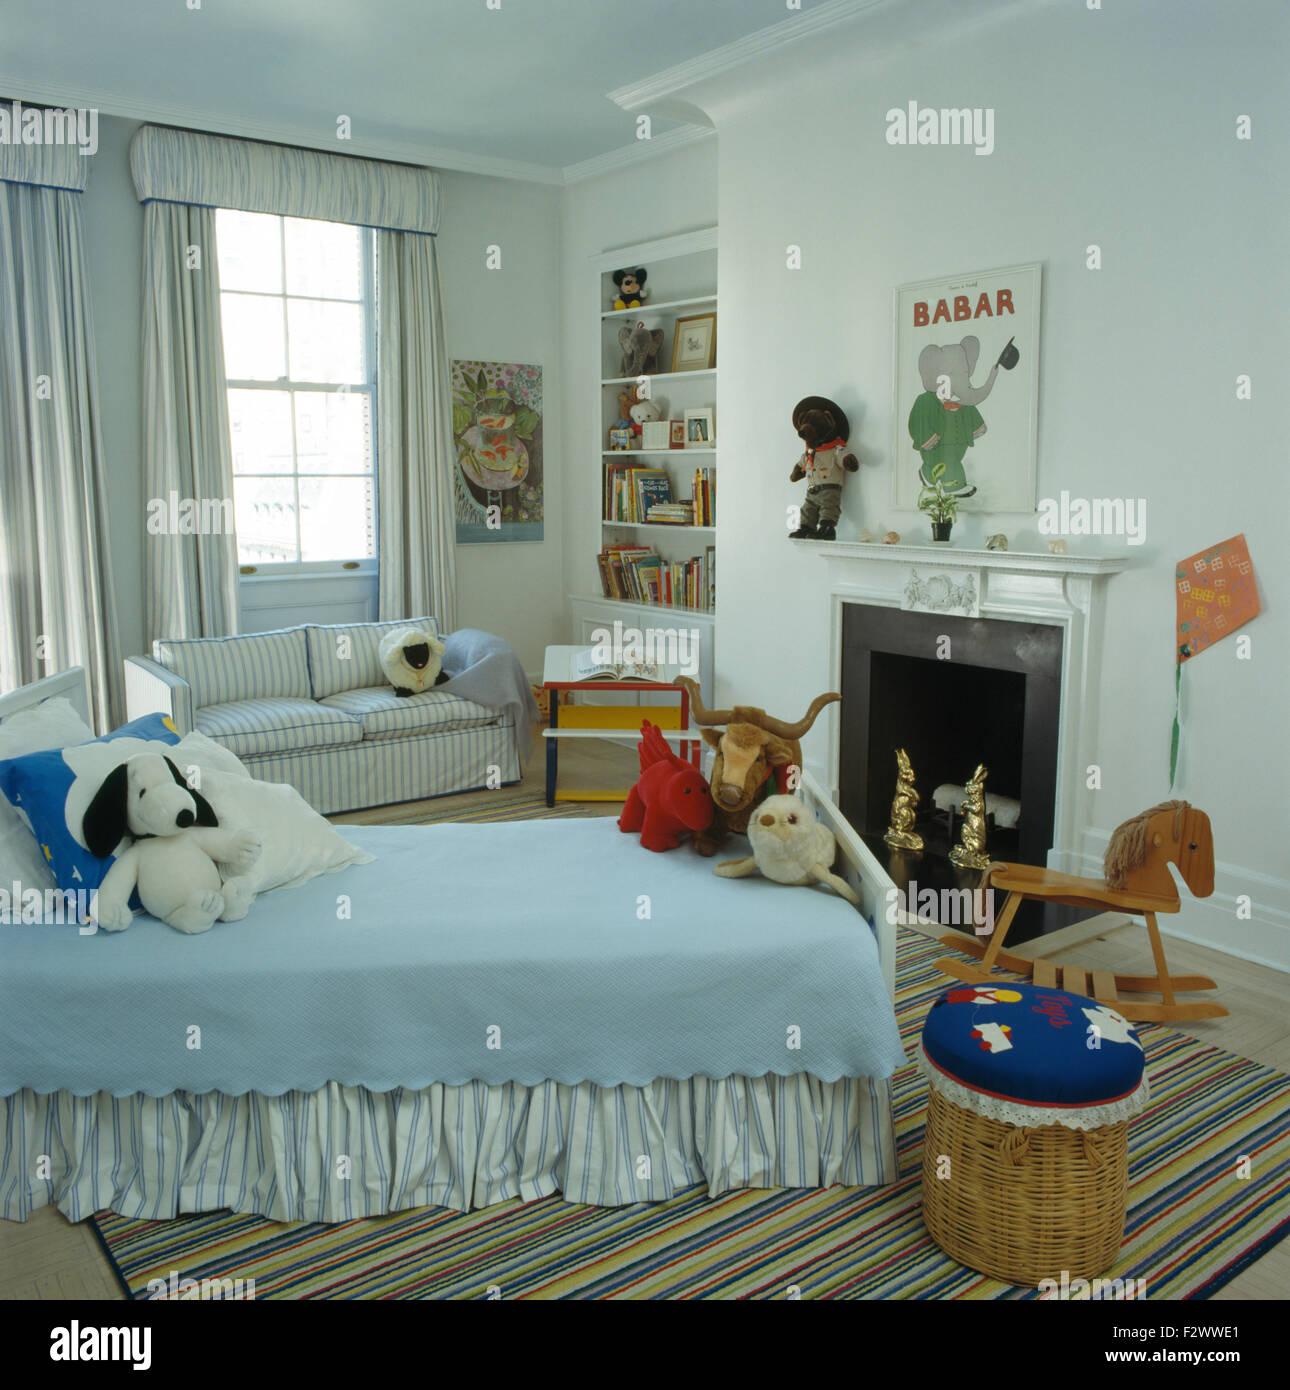 teppich unterm bett great grau graue wnde runder teppich with teppich unterm bett cheap zimmer. Black Bedroom Furniture Sets. Home Design Ideas